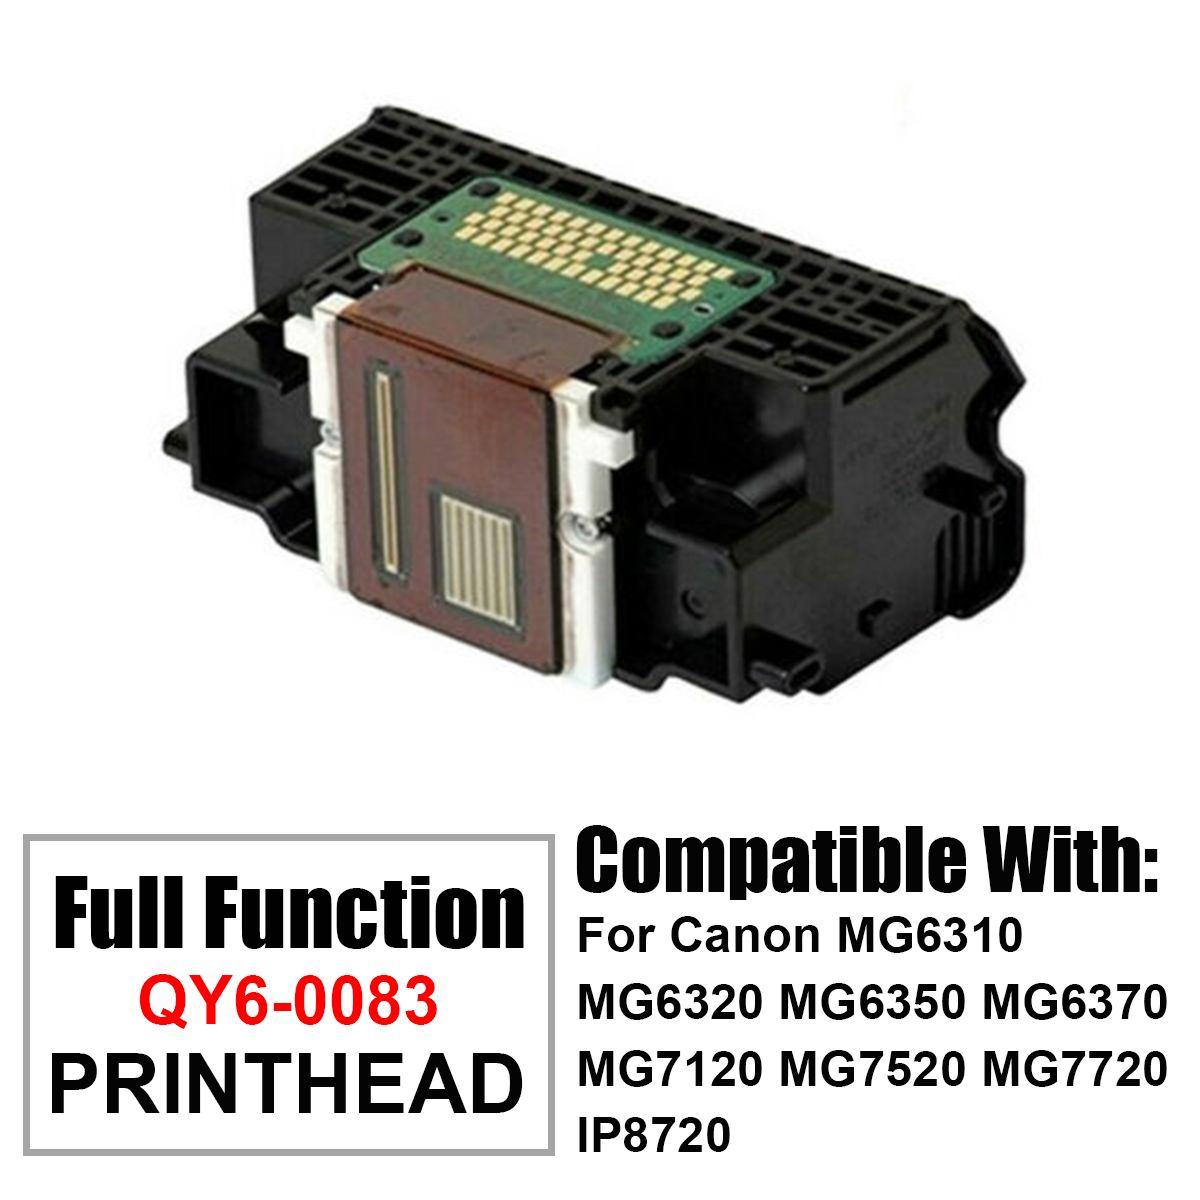 NEW 1Pcs Printhead Print Head Printer Parts For Canon QY6-0083-000 MG6320 MG7120 MG7520 MG7720 IP8720